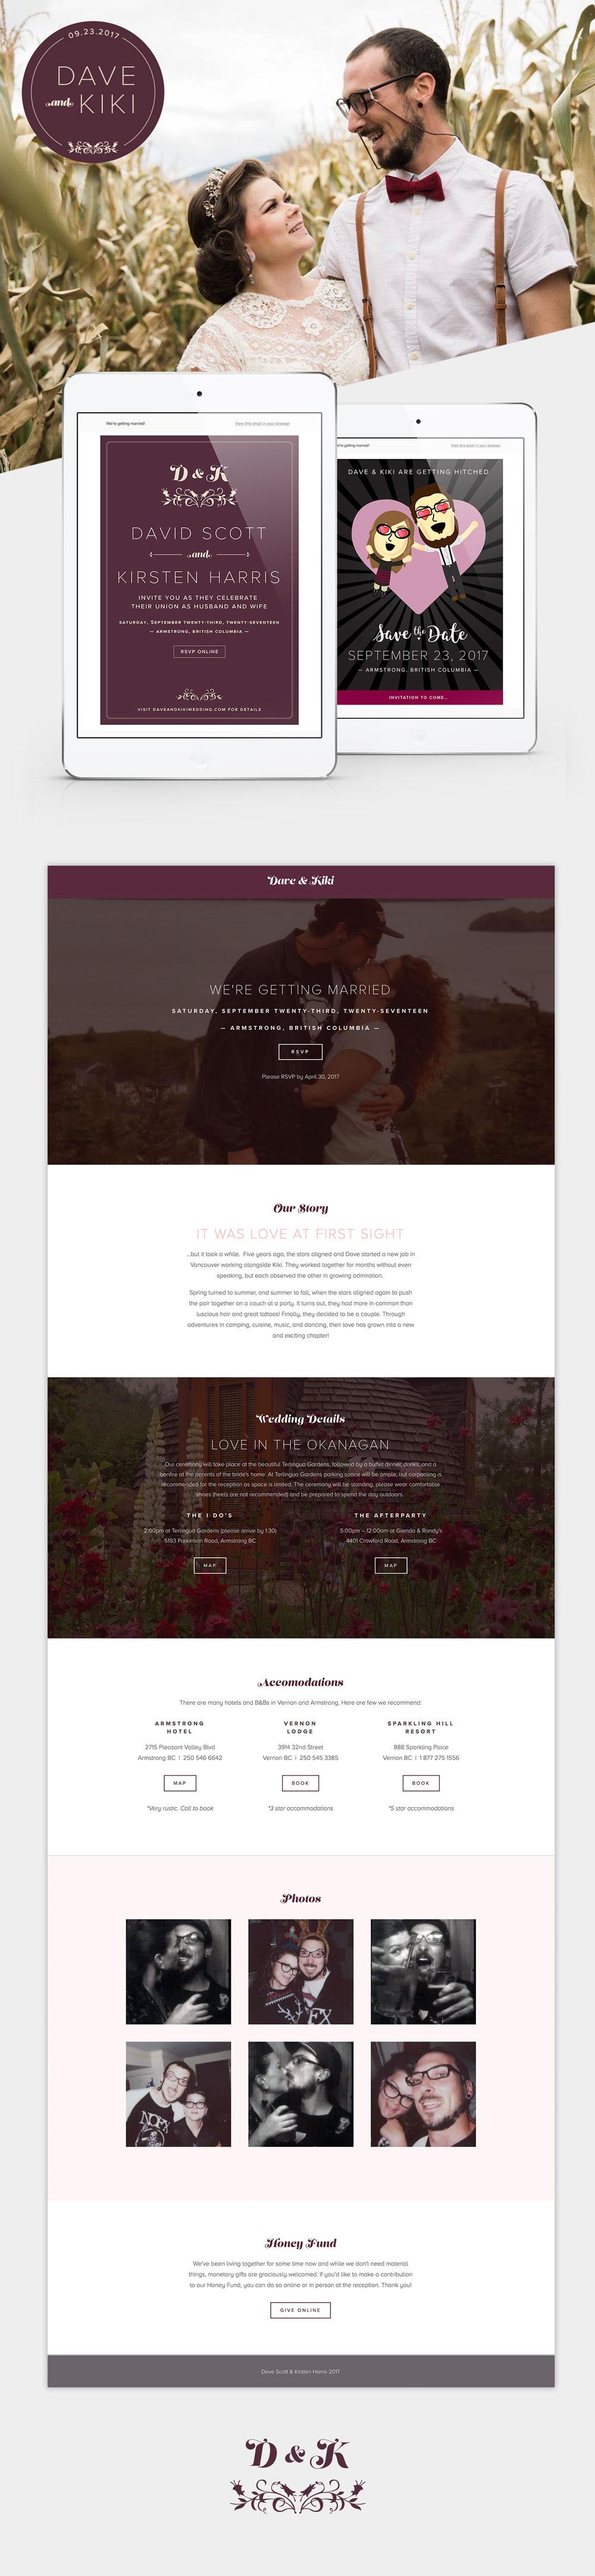 Website, save the date, stamp and e-vite design by Vancouver graphic designer, Jennifer Miranda Grigor //  jennifer-miranda.com